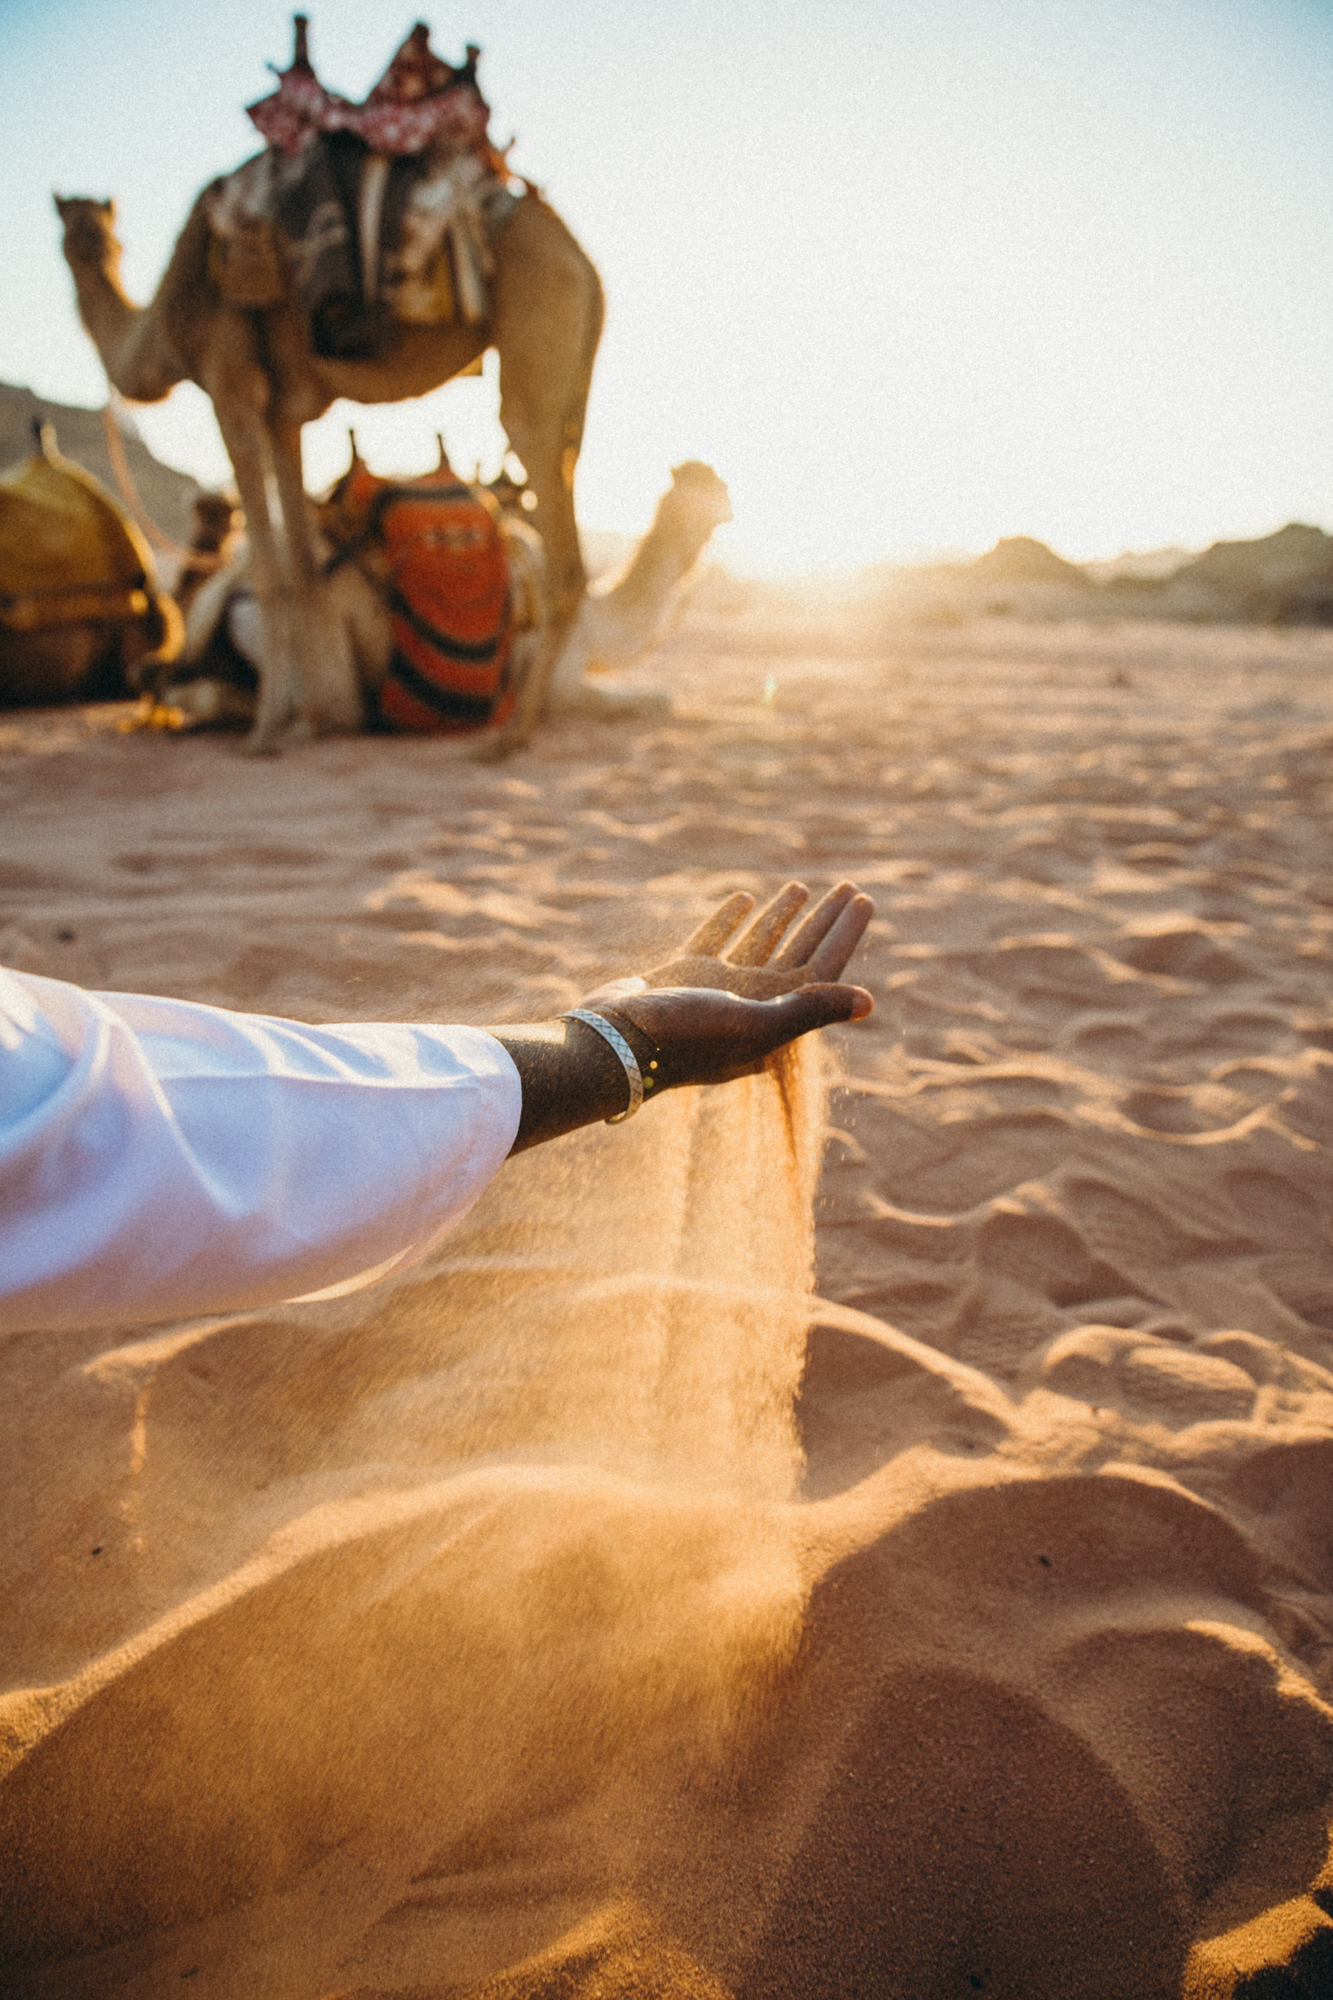 The desert is captivating.